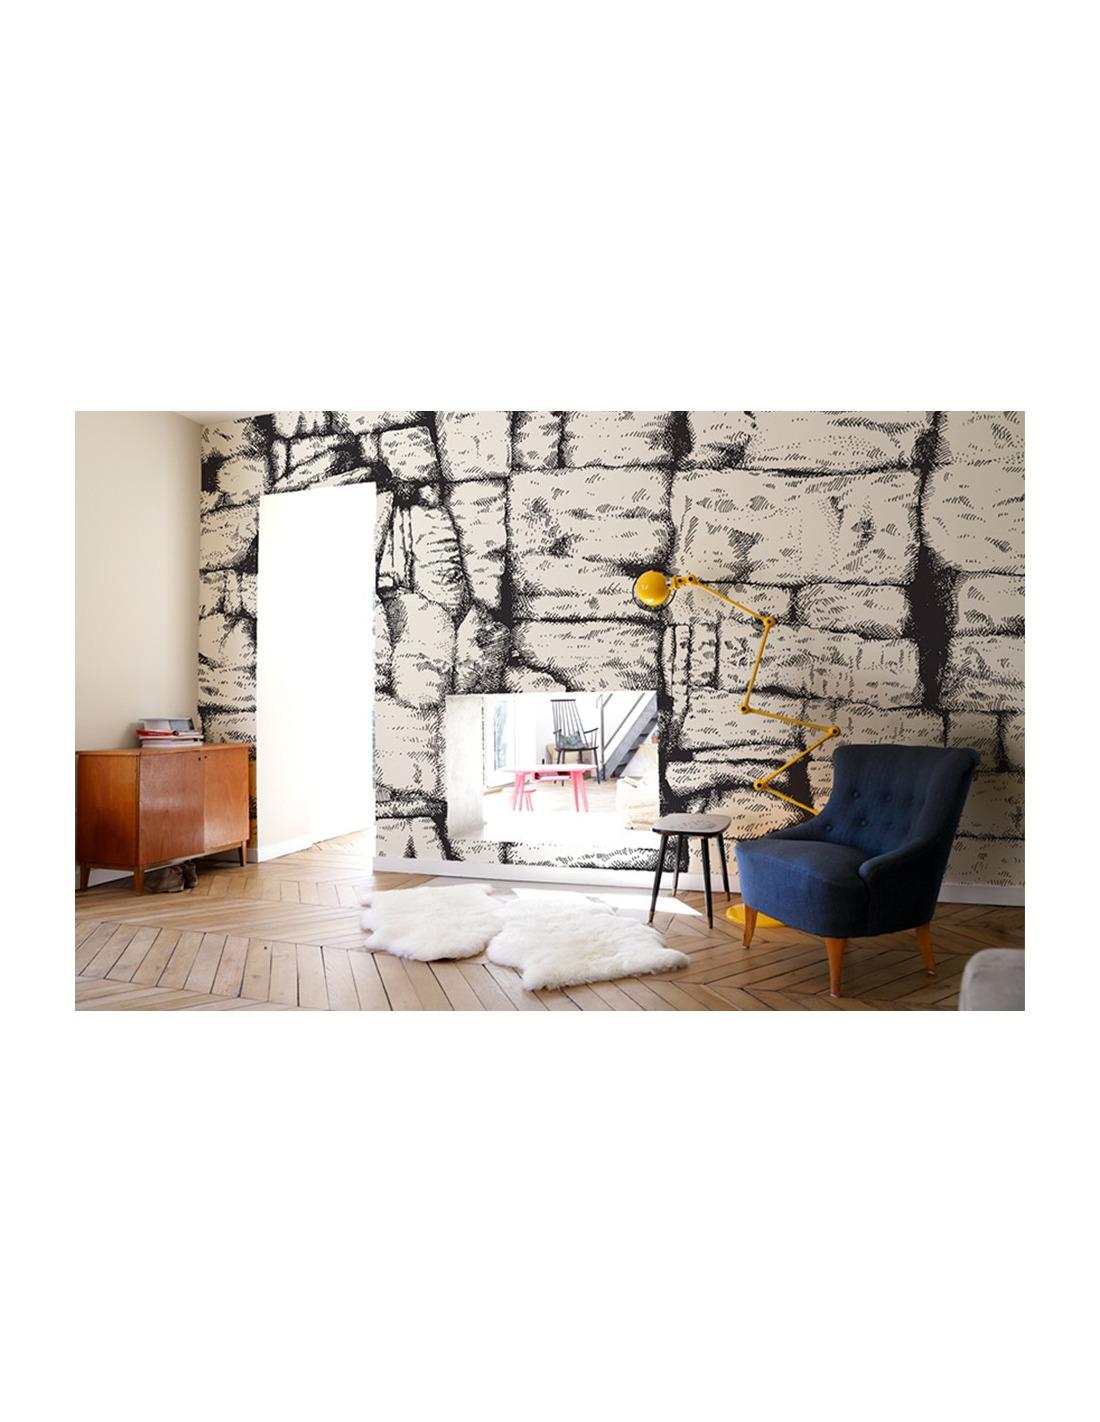 poser du papier peint intiss free murs humide with poser du papier peint intiss comment poser. Black Bedroom Furniture Sets. Home Design Ideas